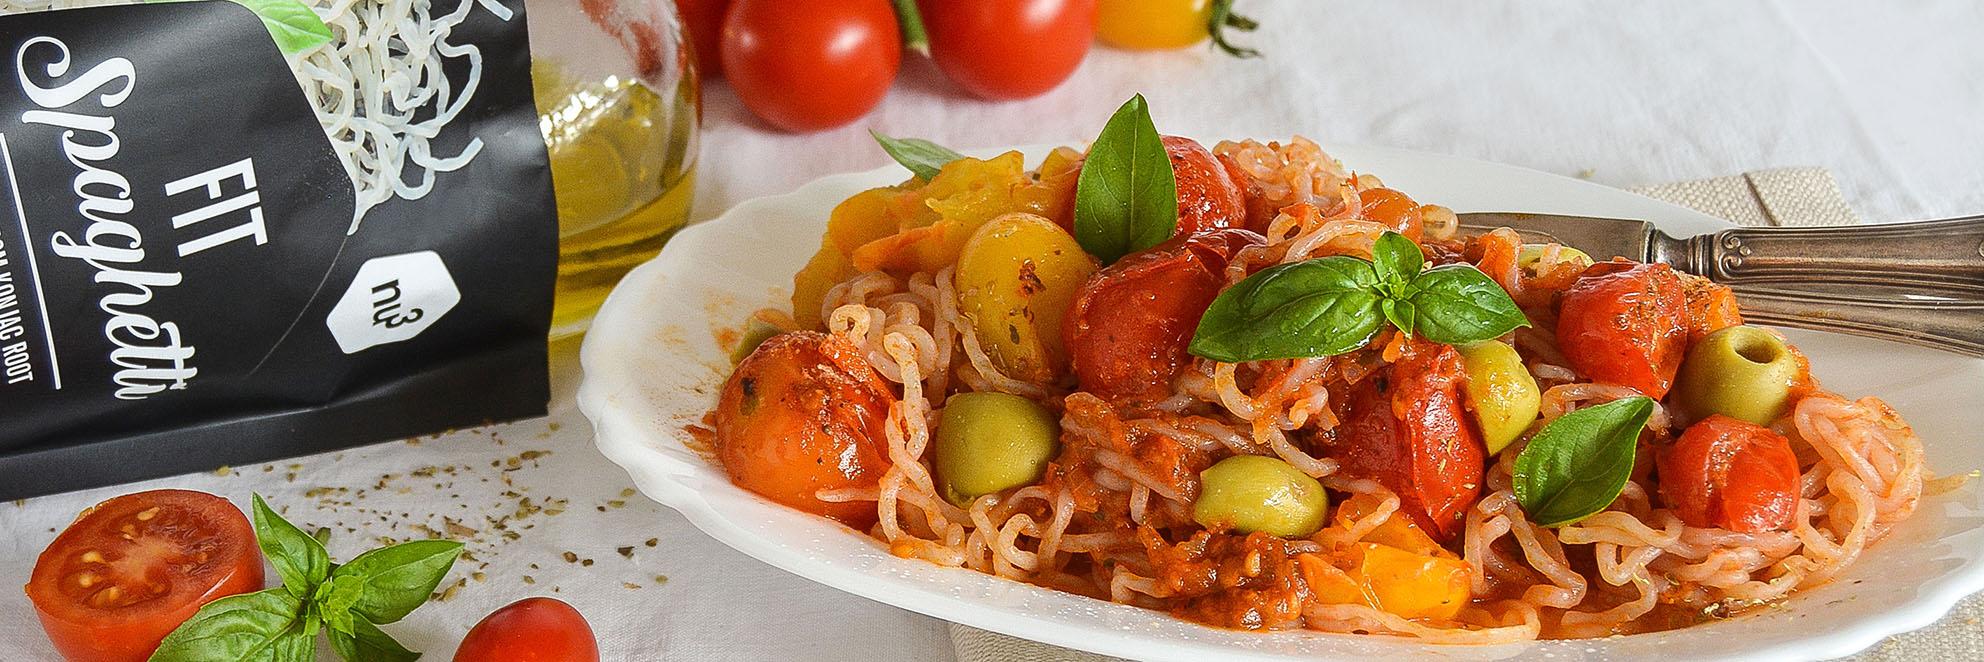 Spaghetti pomodorini e olive